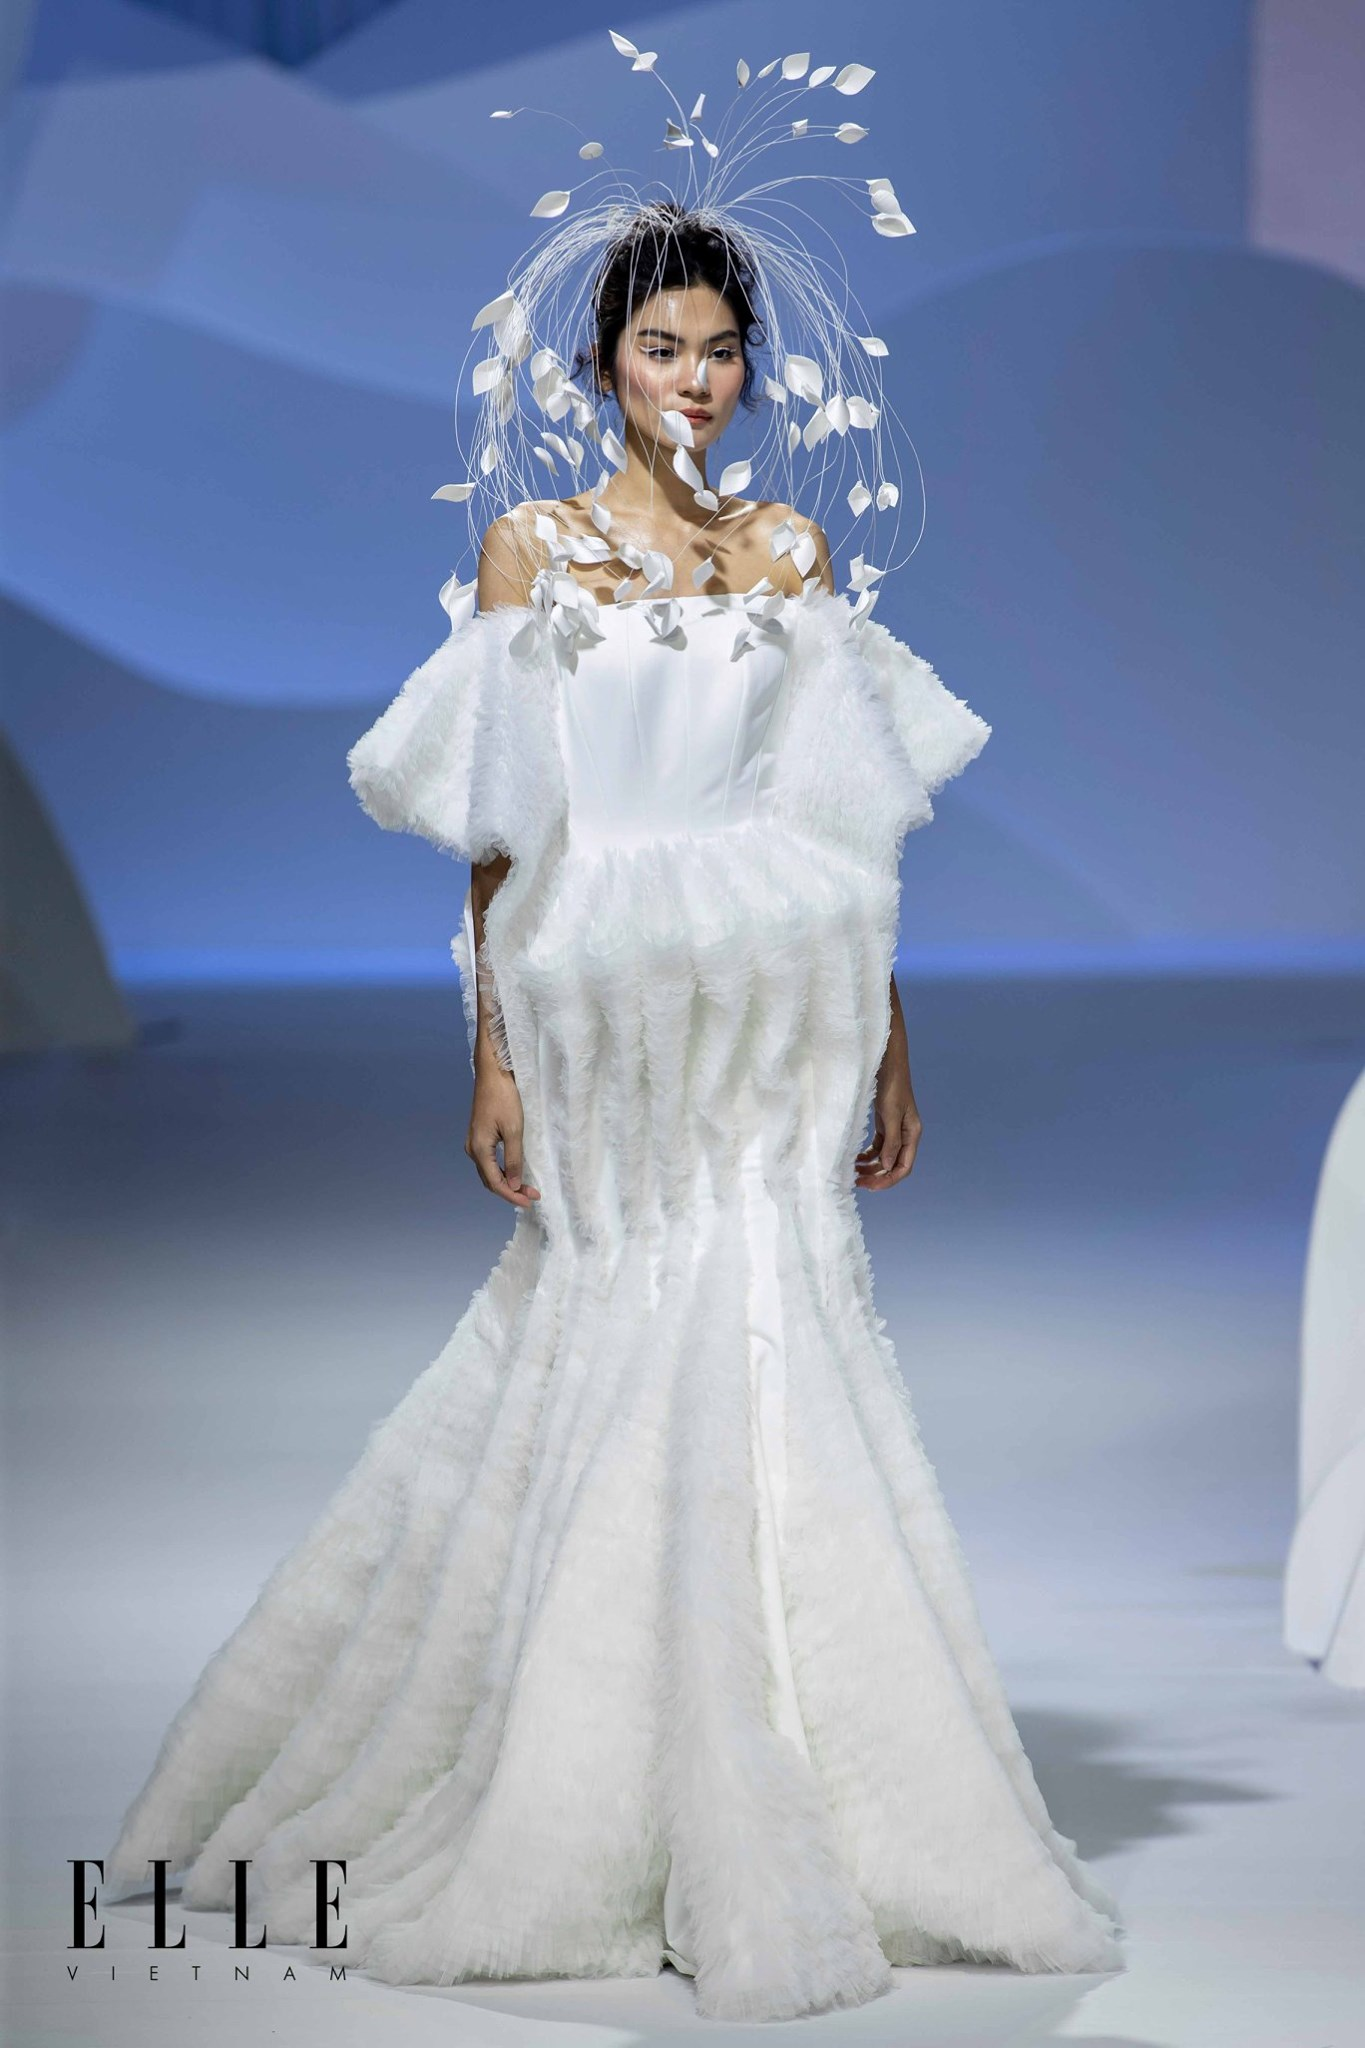 elle-wedding-art-gallery_thiet-ke-cua-ntk-truong-thanh-hai